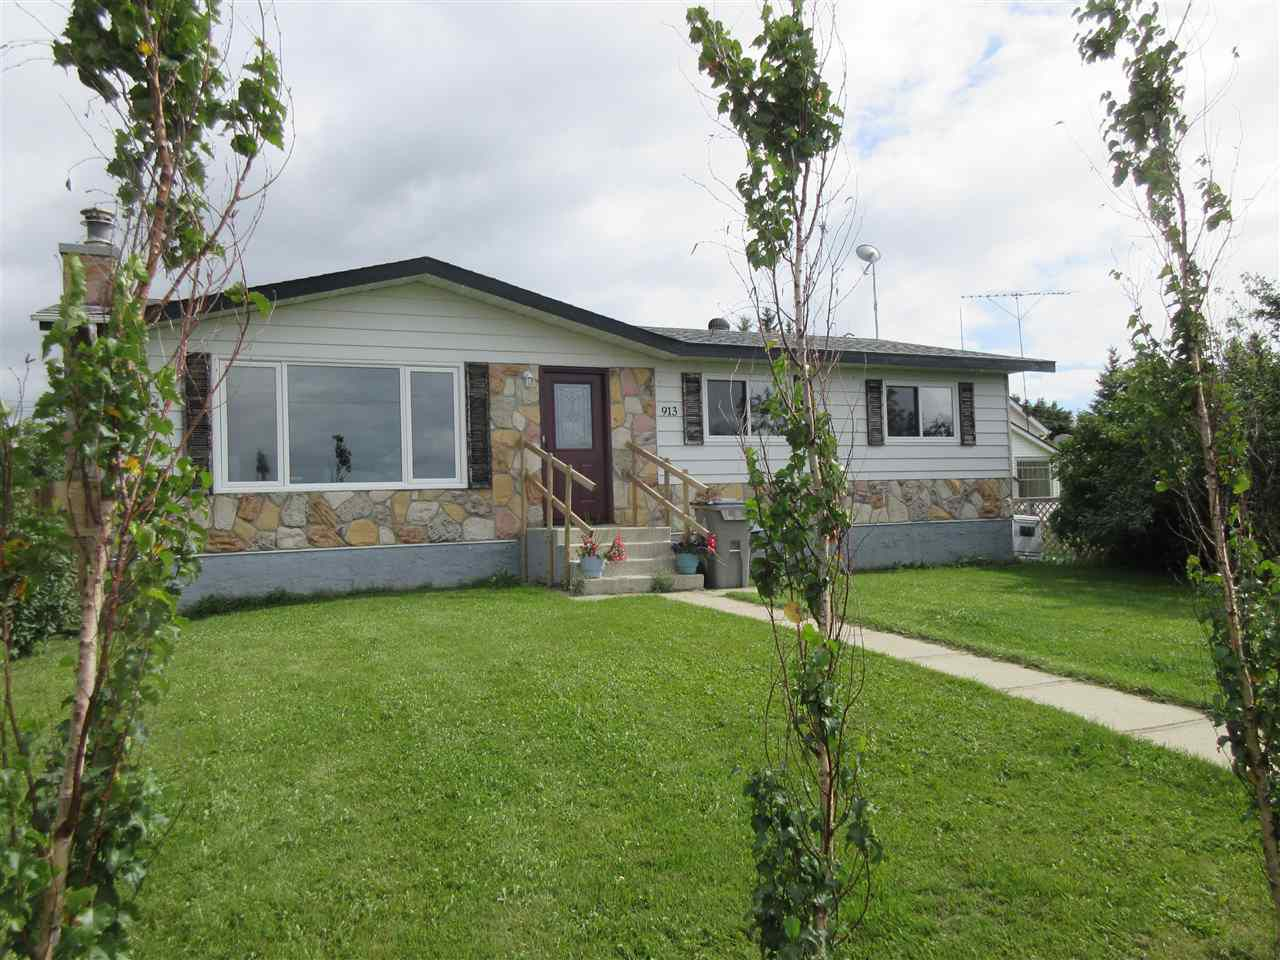 Main Photo: 913 2 Street: Thorhild House for sale : MLS®# E4148663